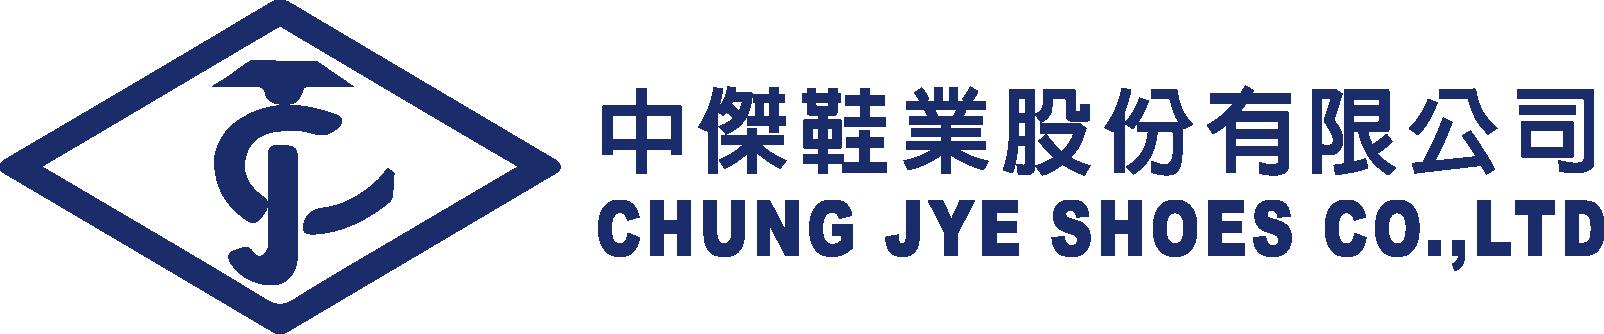 Chung-Jye Co.